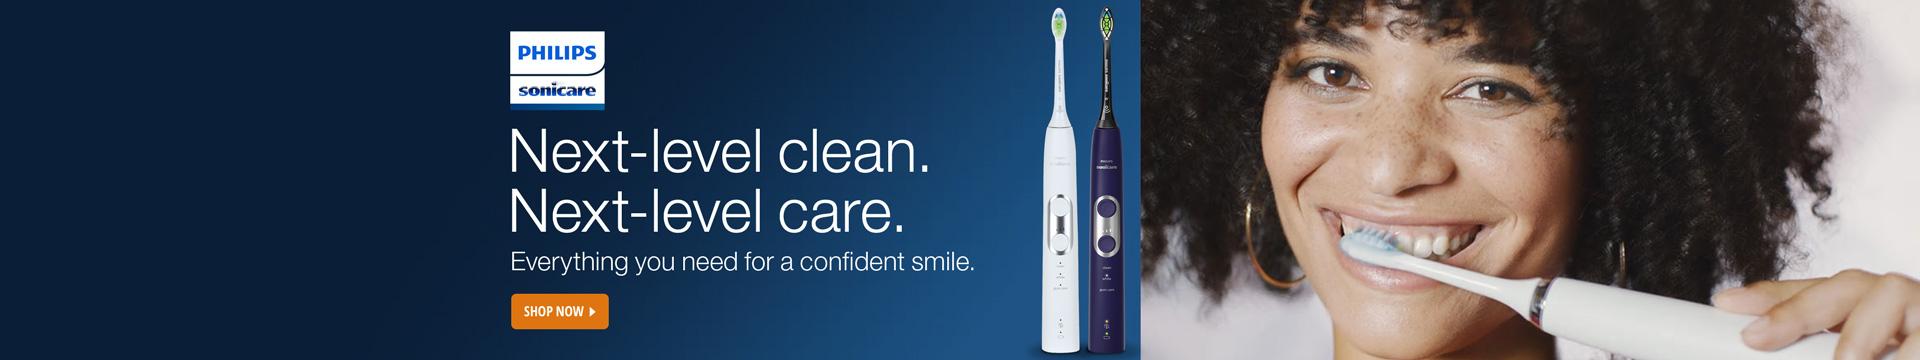 Next-level clean, next-level care